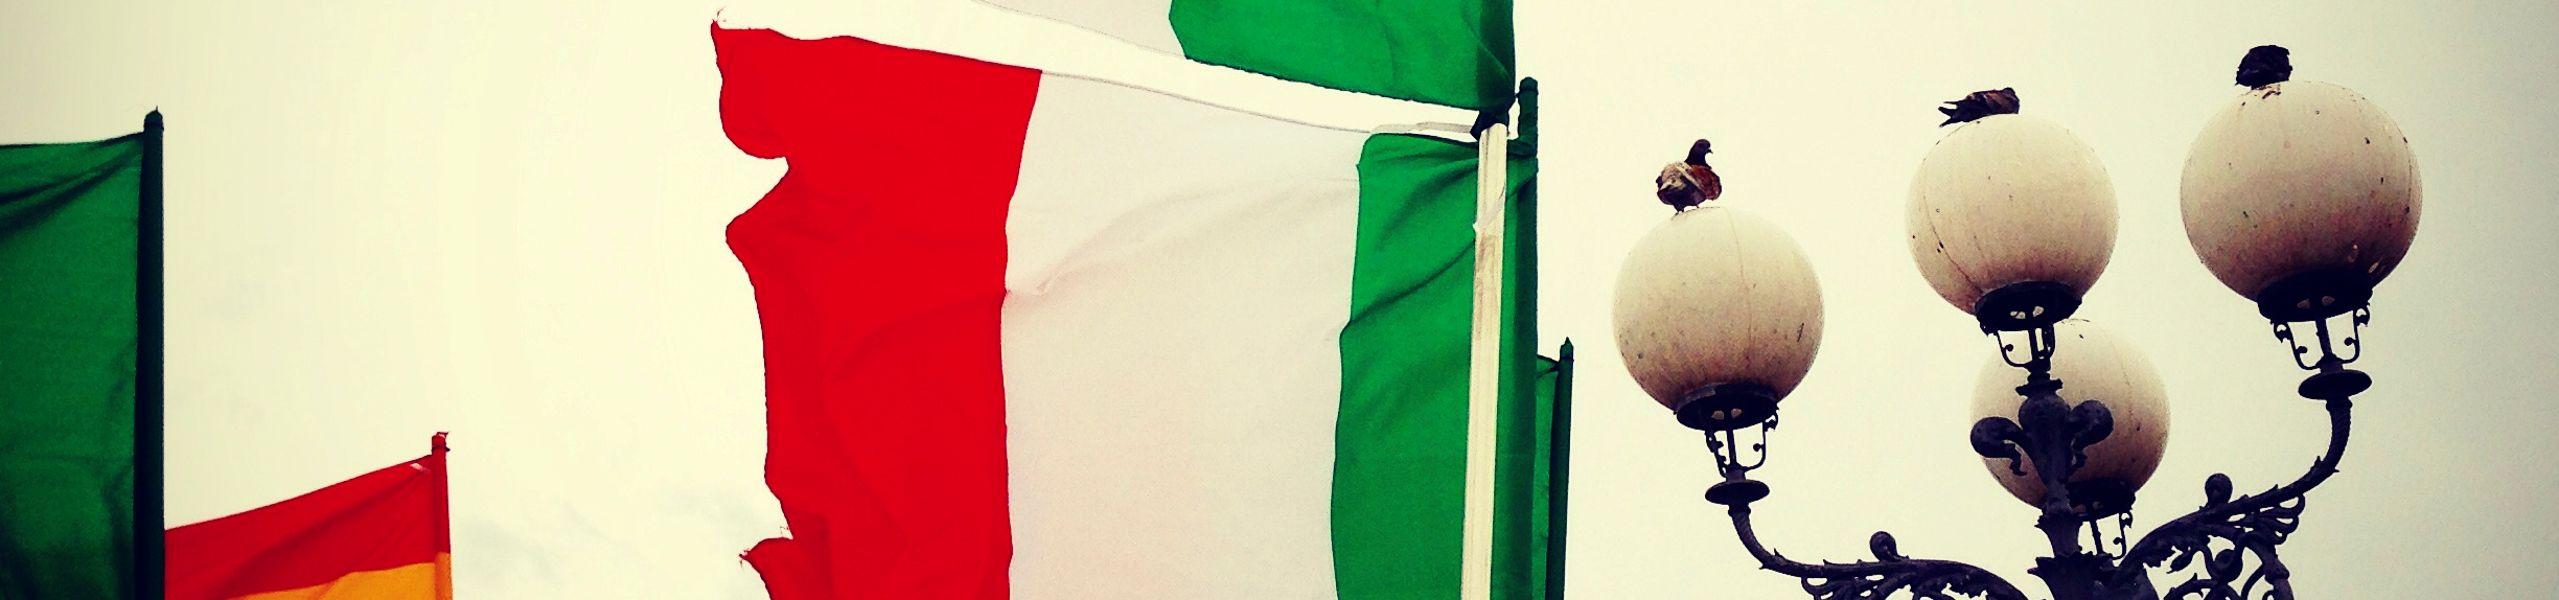 20140629_Instagram_Italian_Flag_MGP_4808.jpg